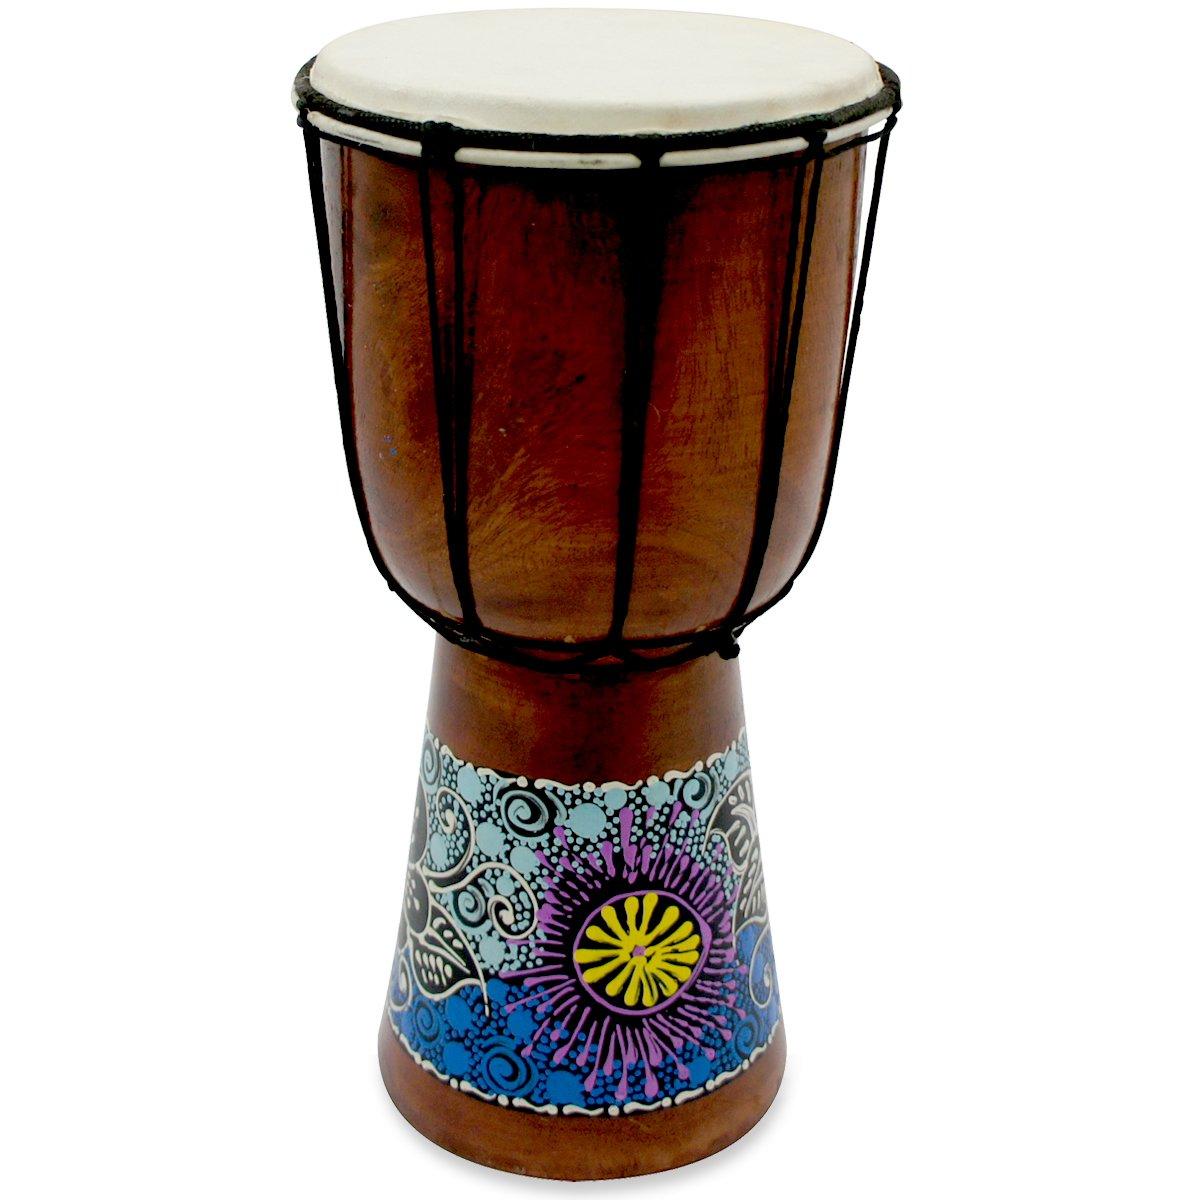 8'' Wooden Djembe Doumbek Darbuka Hand Drum Egyptian Design - Pattern May Vary